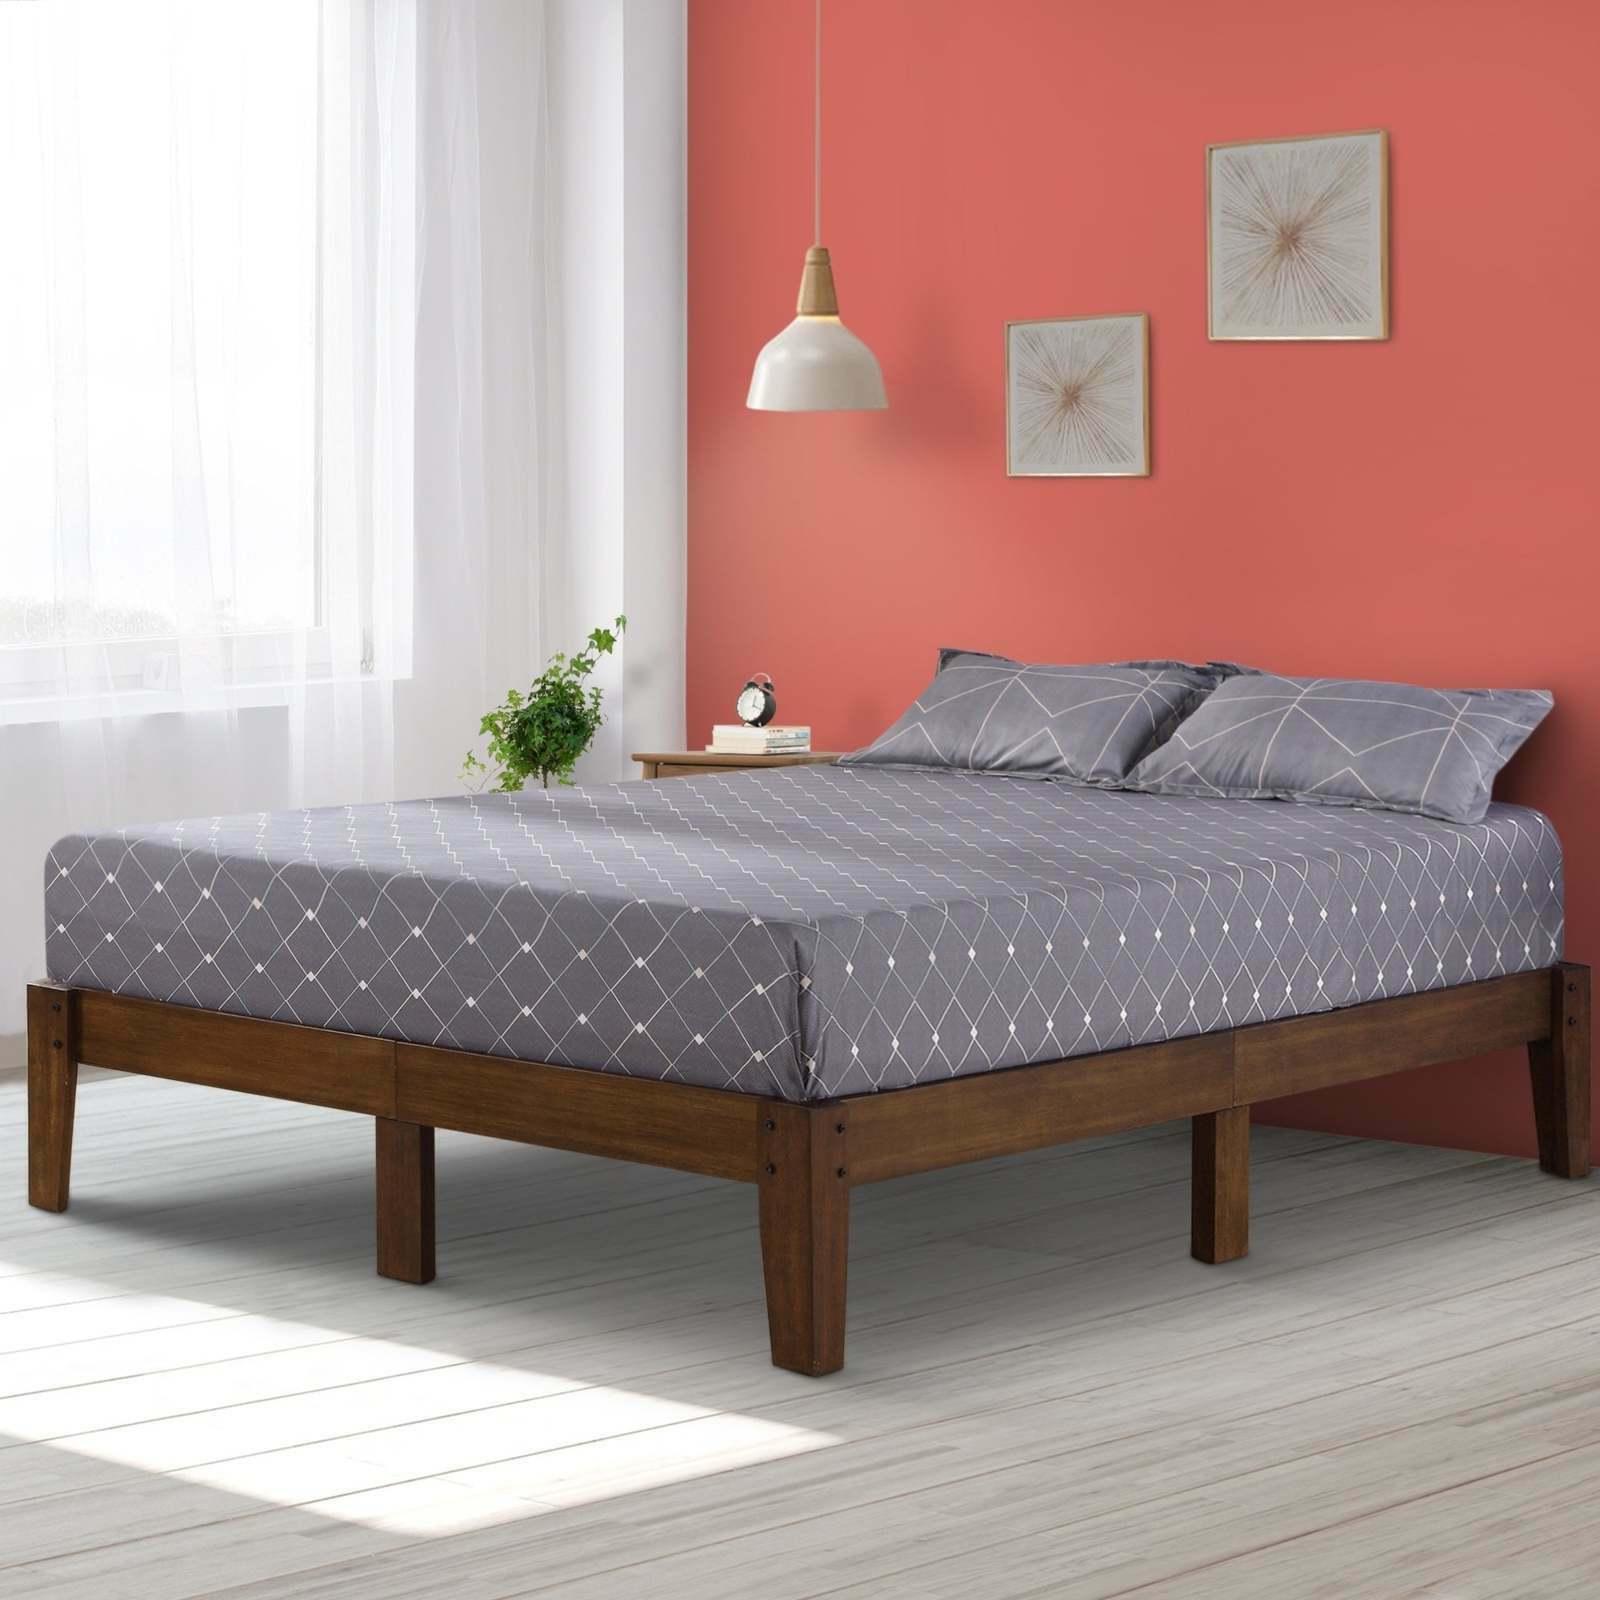 rustic wood platform bed frame queen size